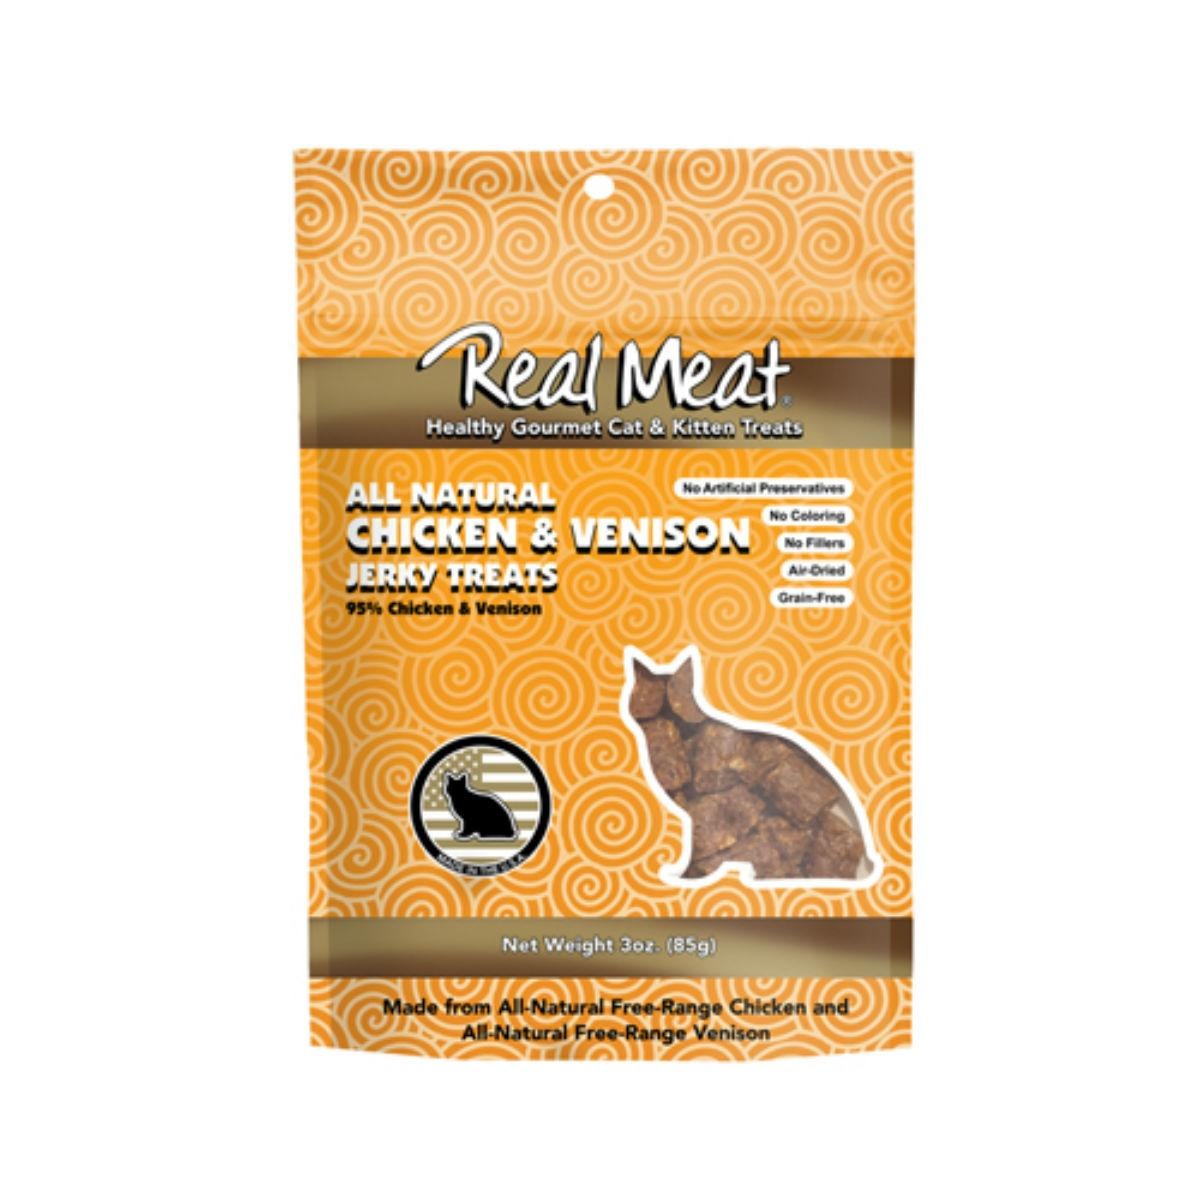 Real Meat Jerky Cat Treat - Chicken & Venison